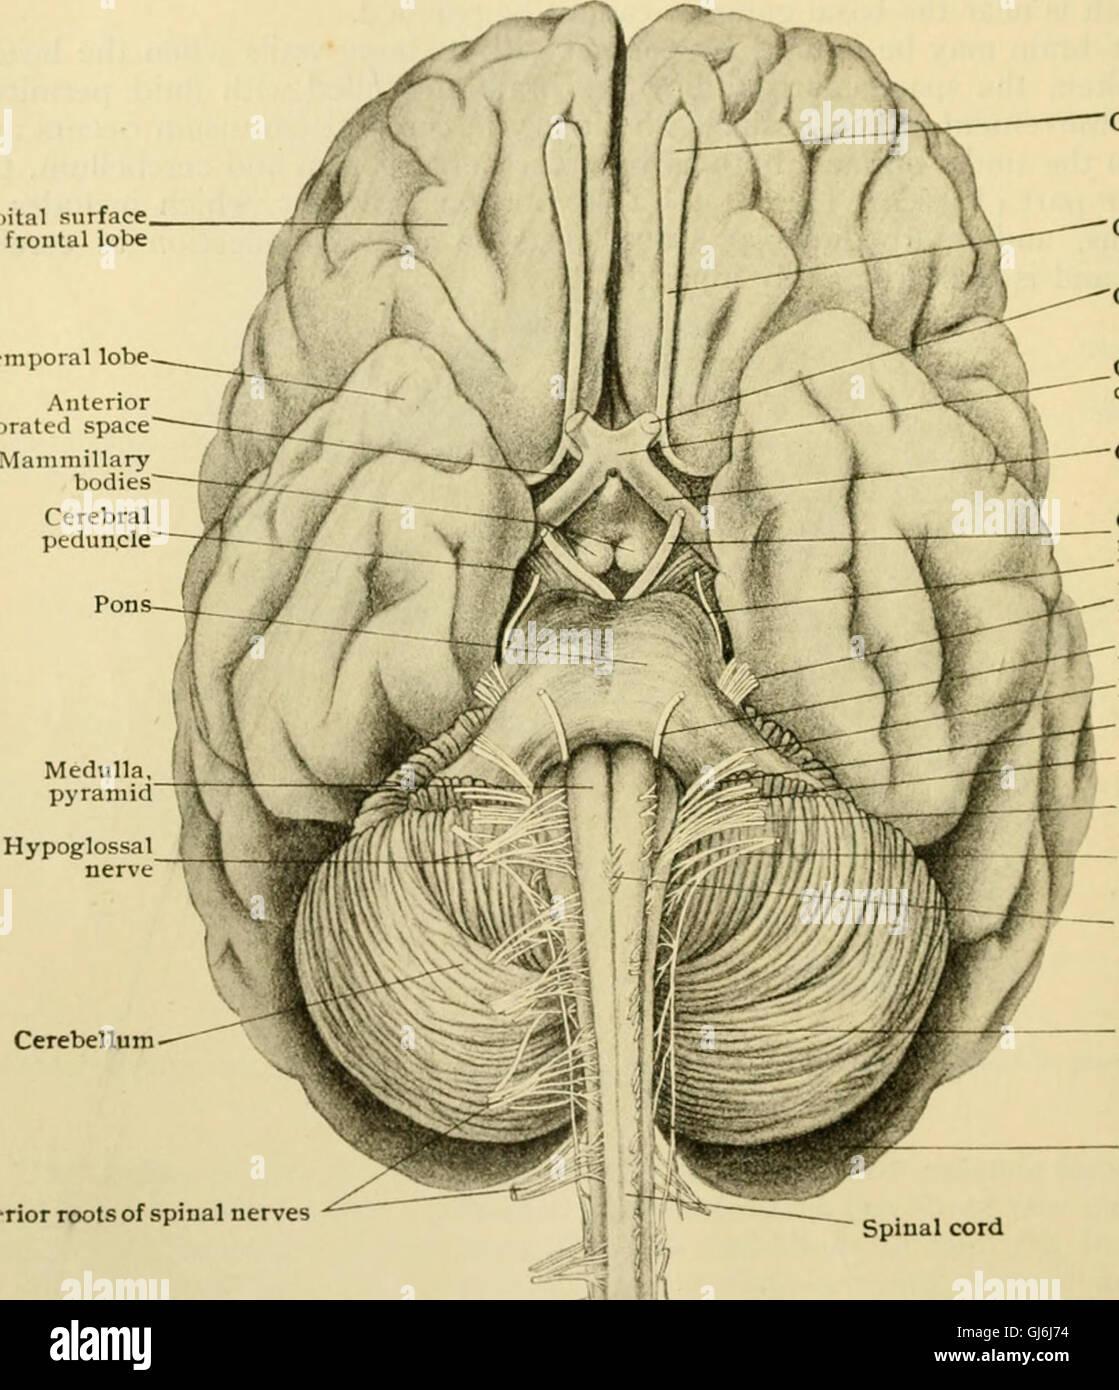 Human Anatomy Including Structure Development Stock Photos & Human ...